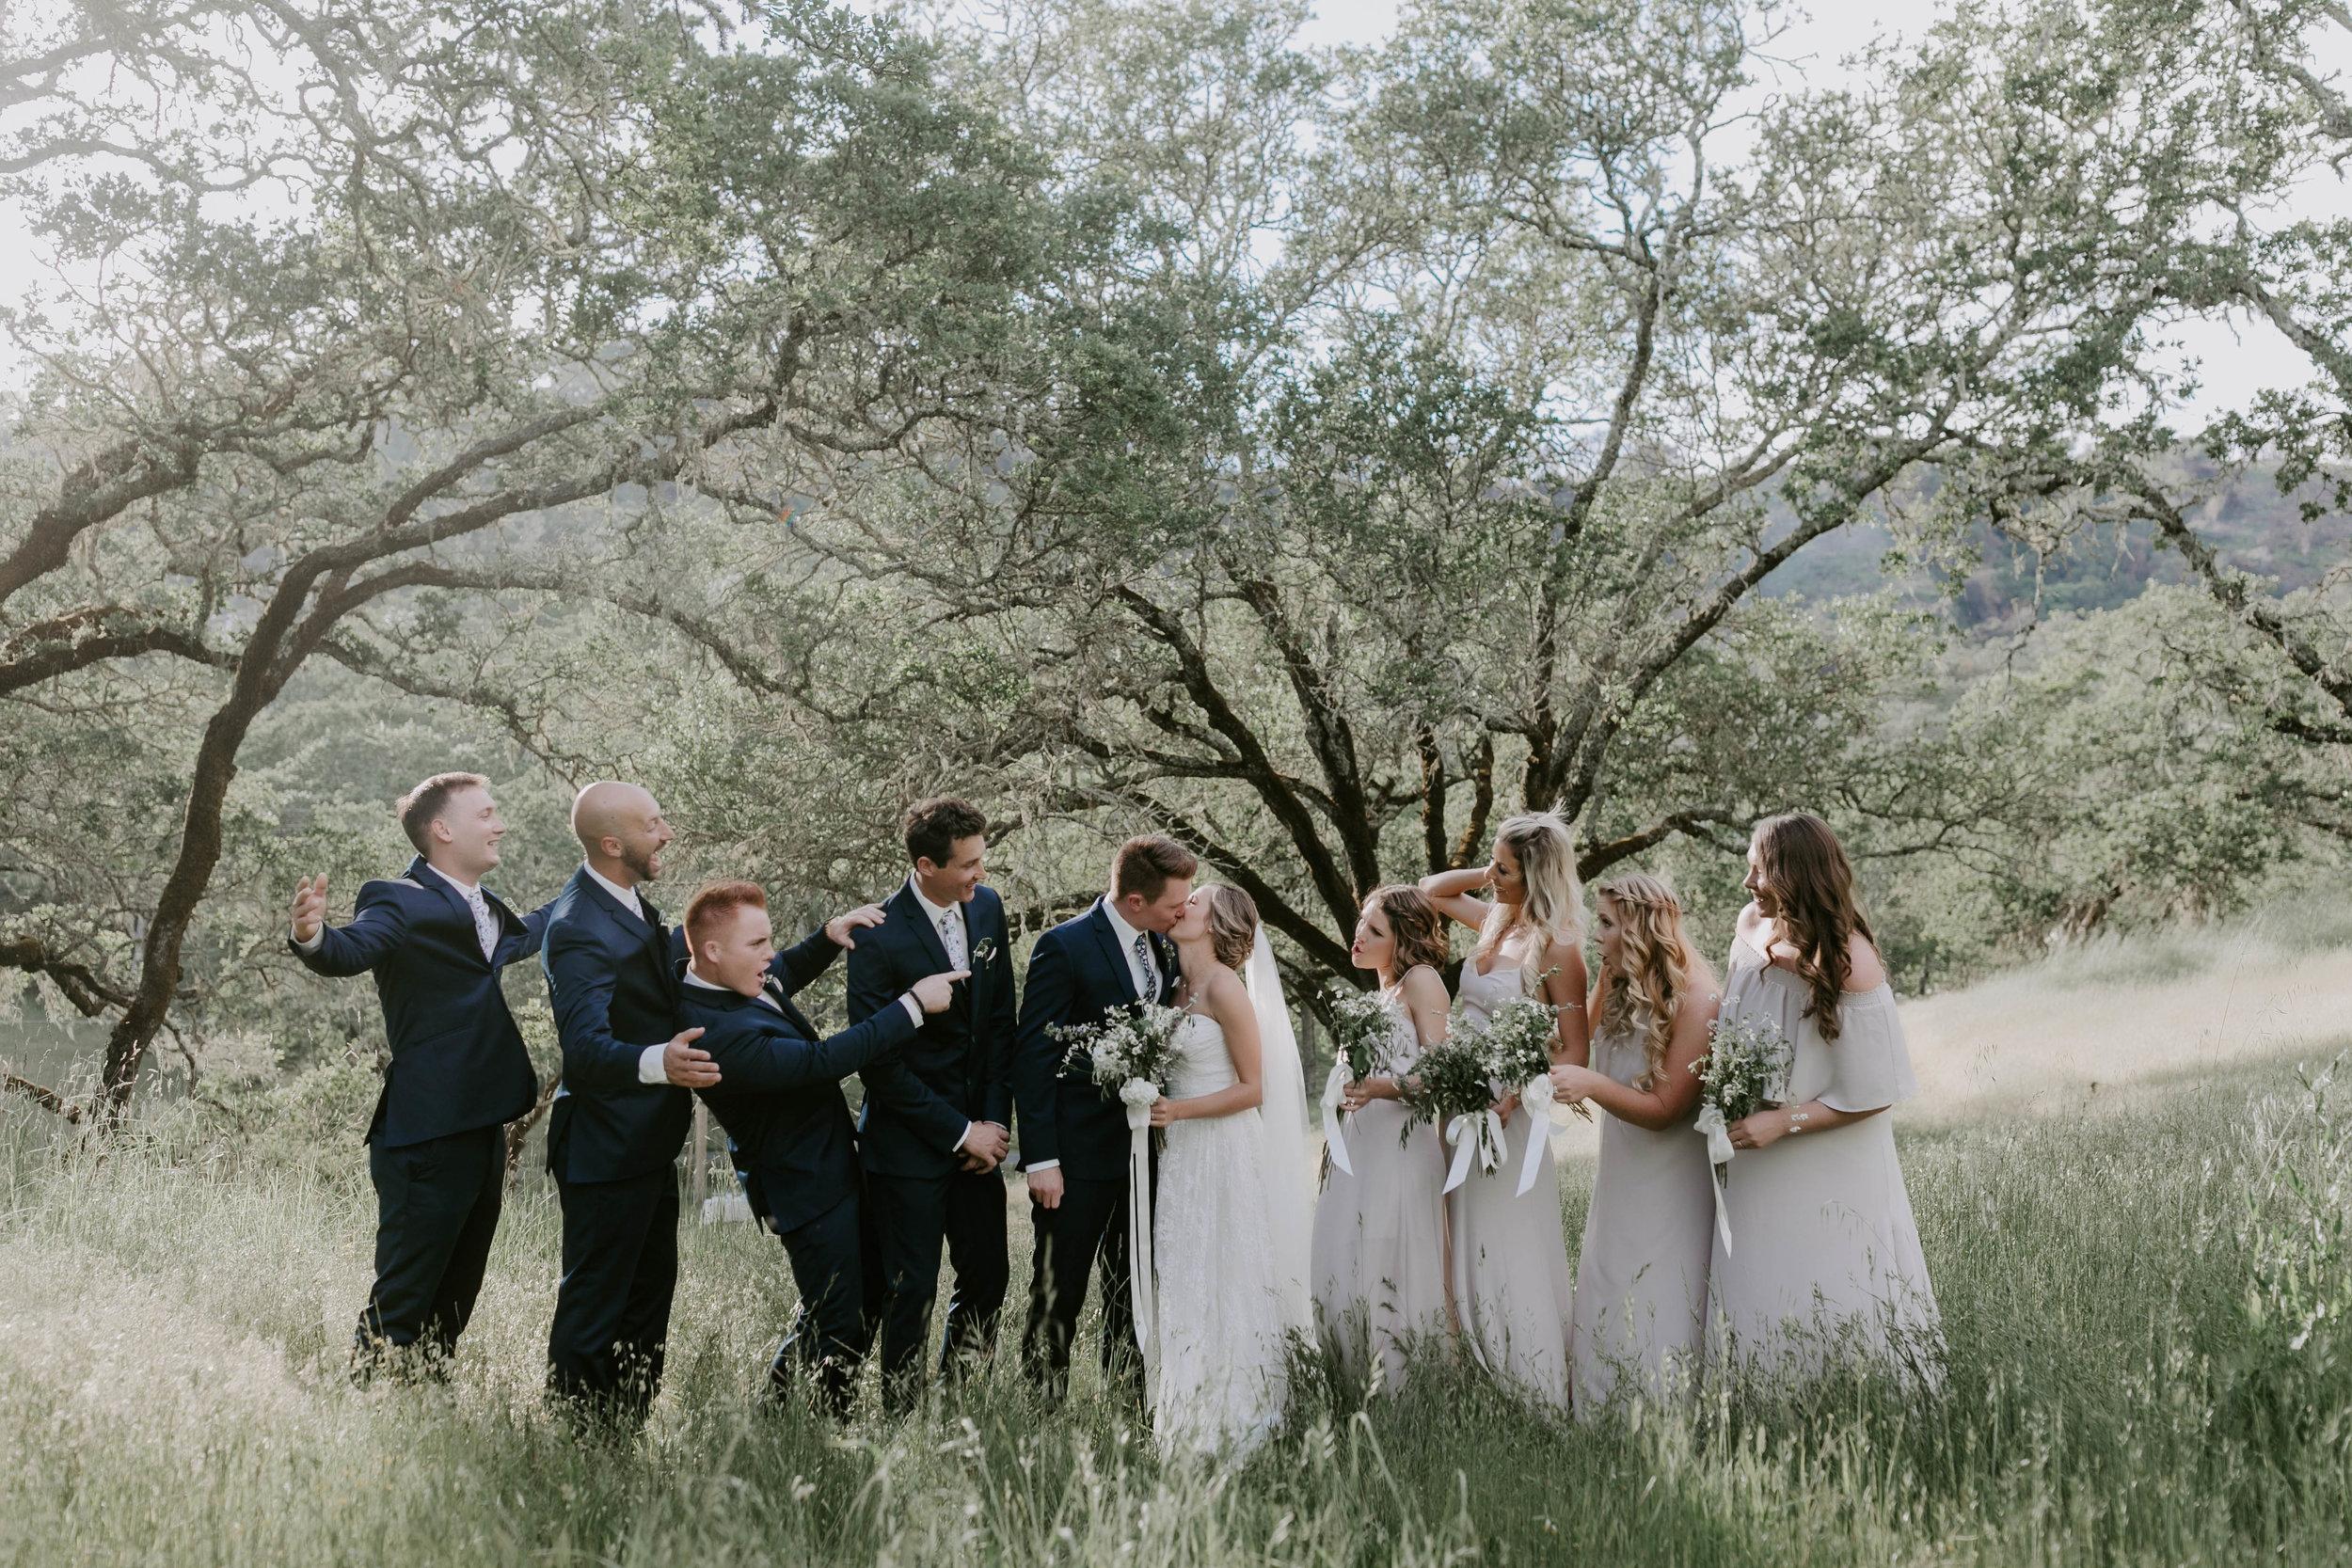 M+J-Family & Bridal Party048.jpg